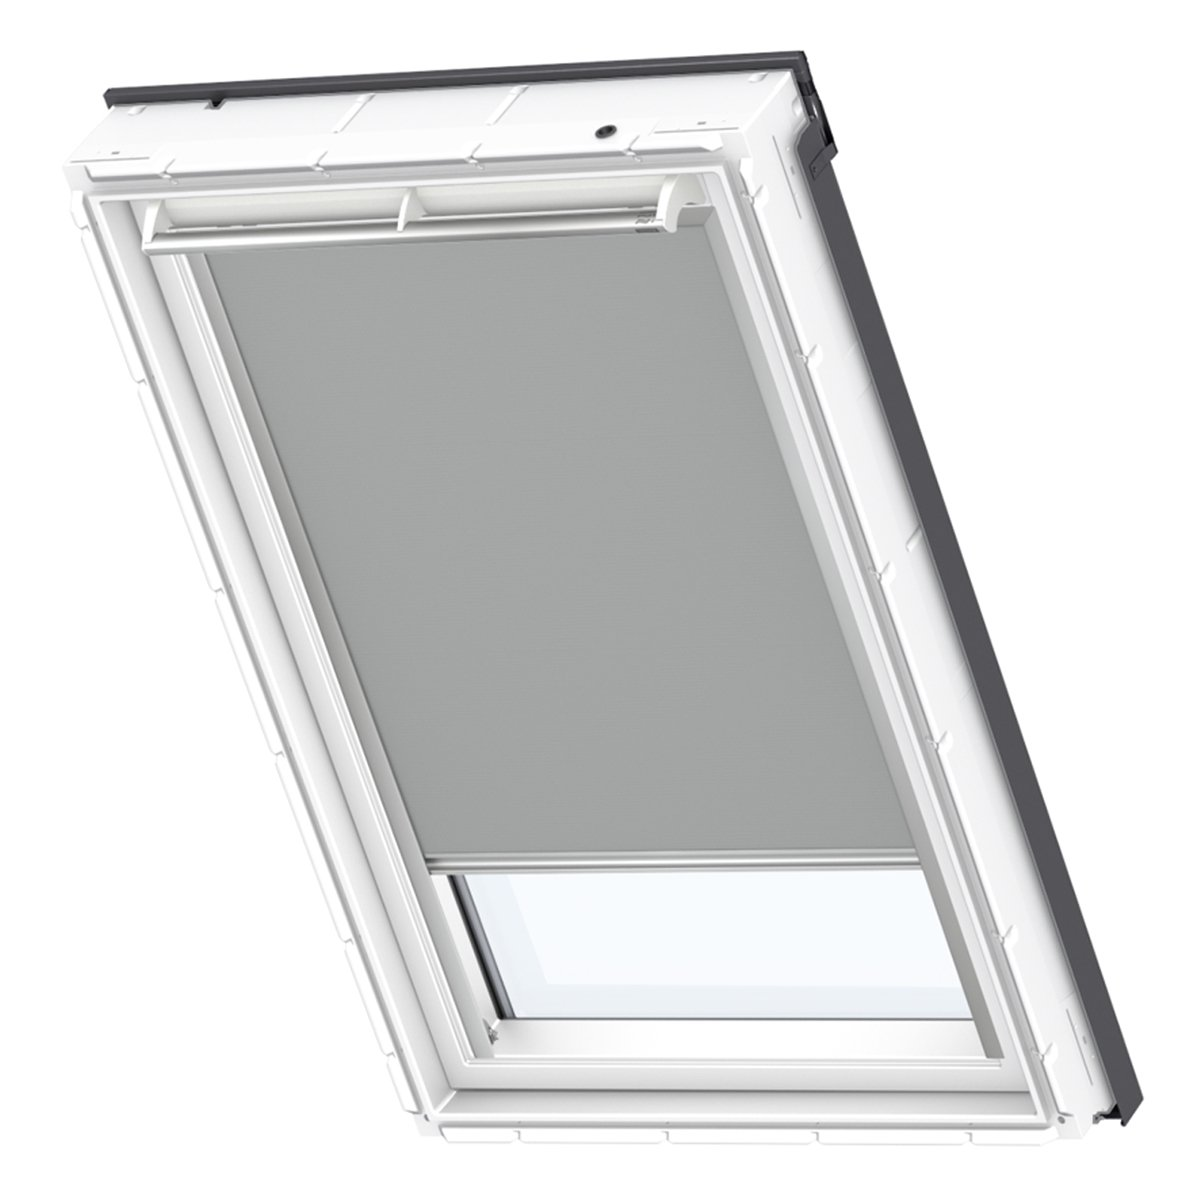 VELUX Original Hitzeschutz-Markise Hitzeschutz-Markise Hitzeschutz-Markise außen Dachfenster, PK10, Uni Grau d2ddb1